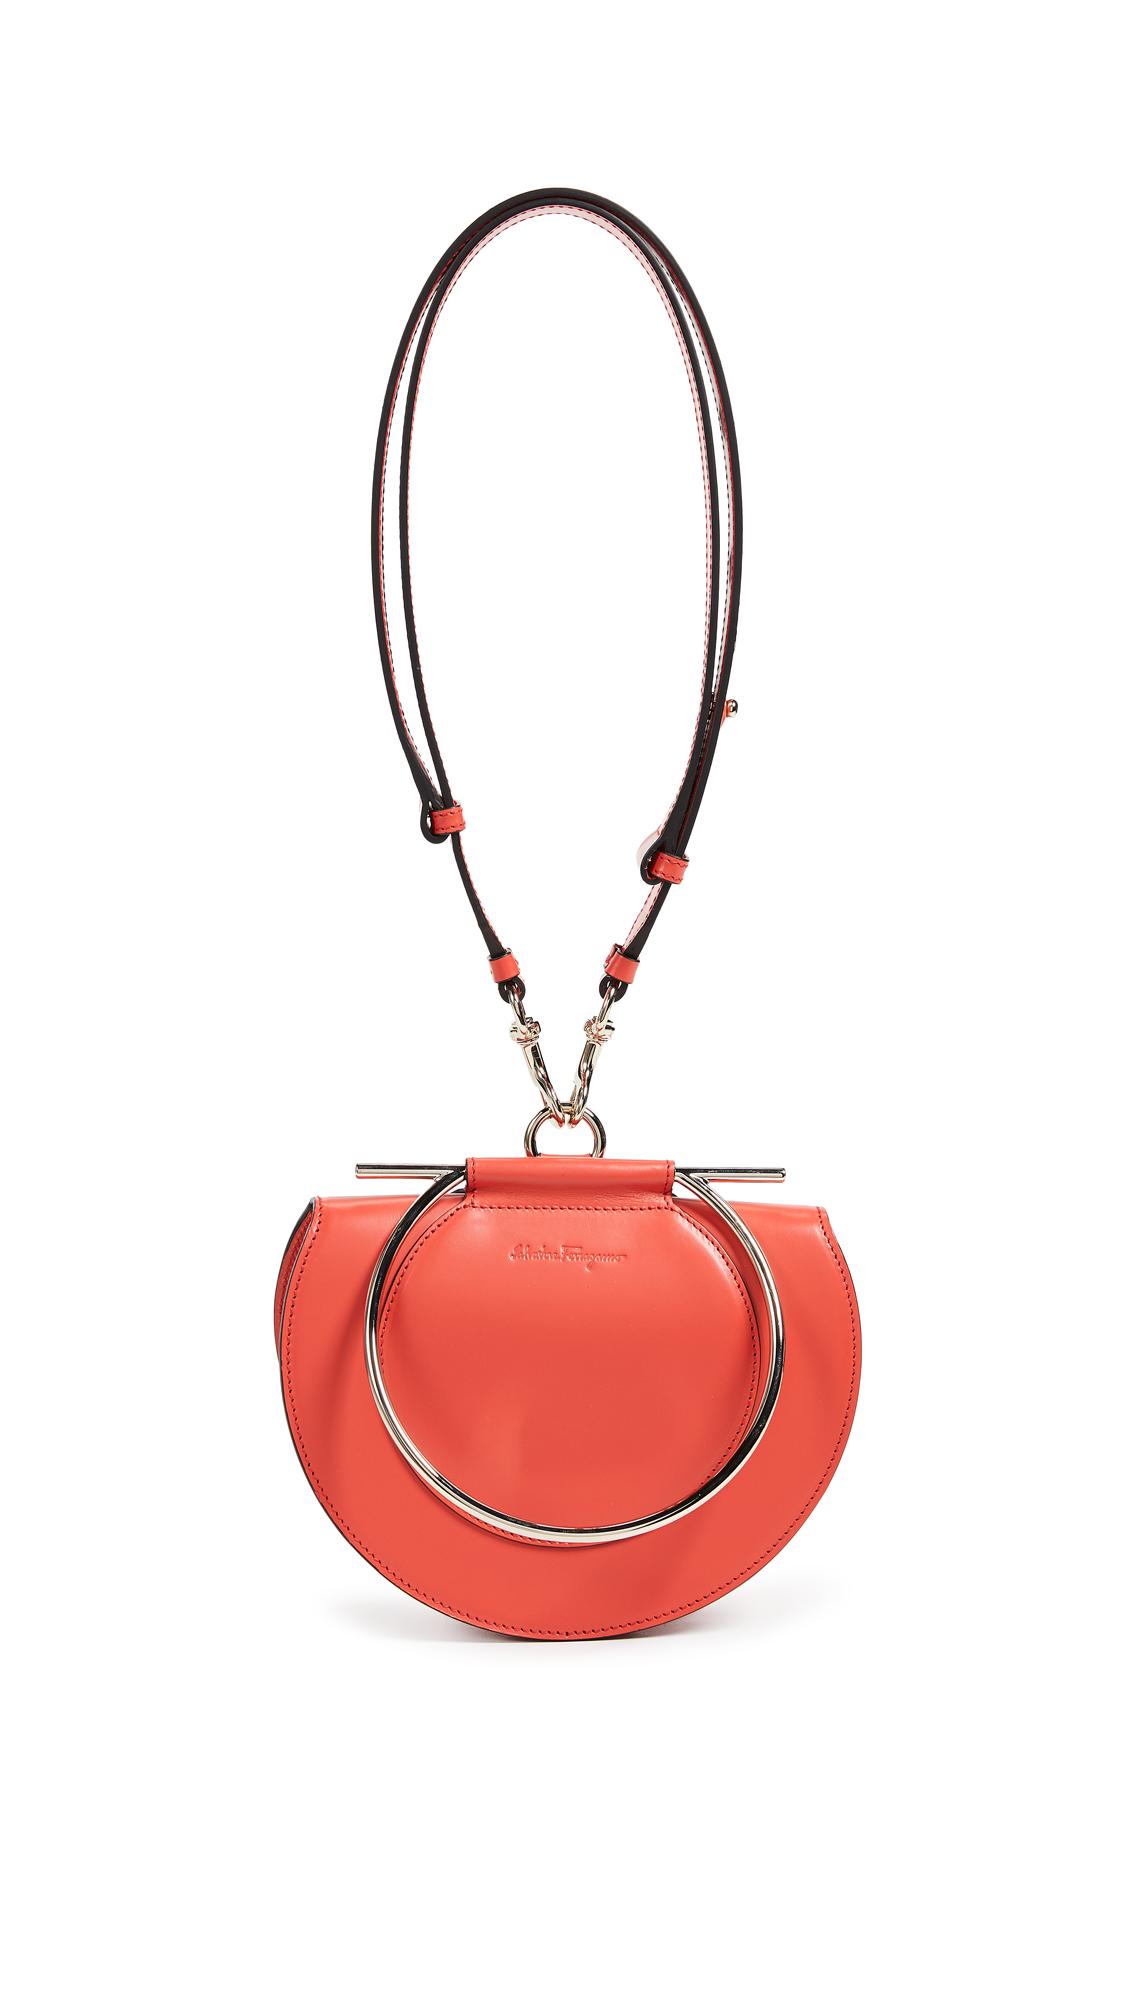 Salvatore Ferragamo Daphne Convertible Bag In Coral  22f8d893f8cdb